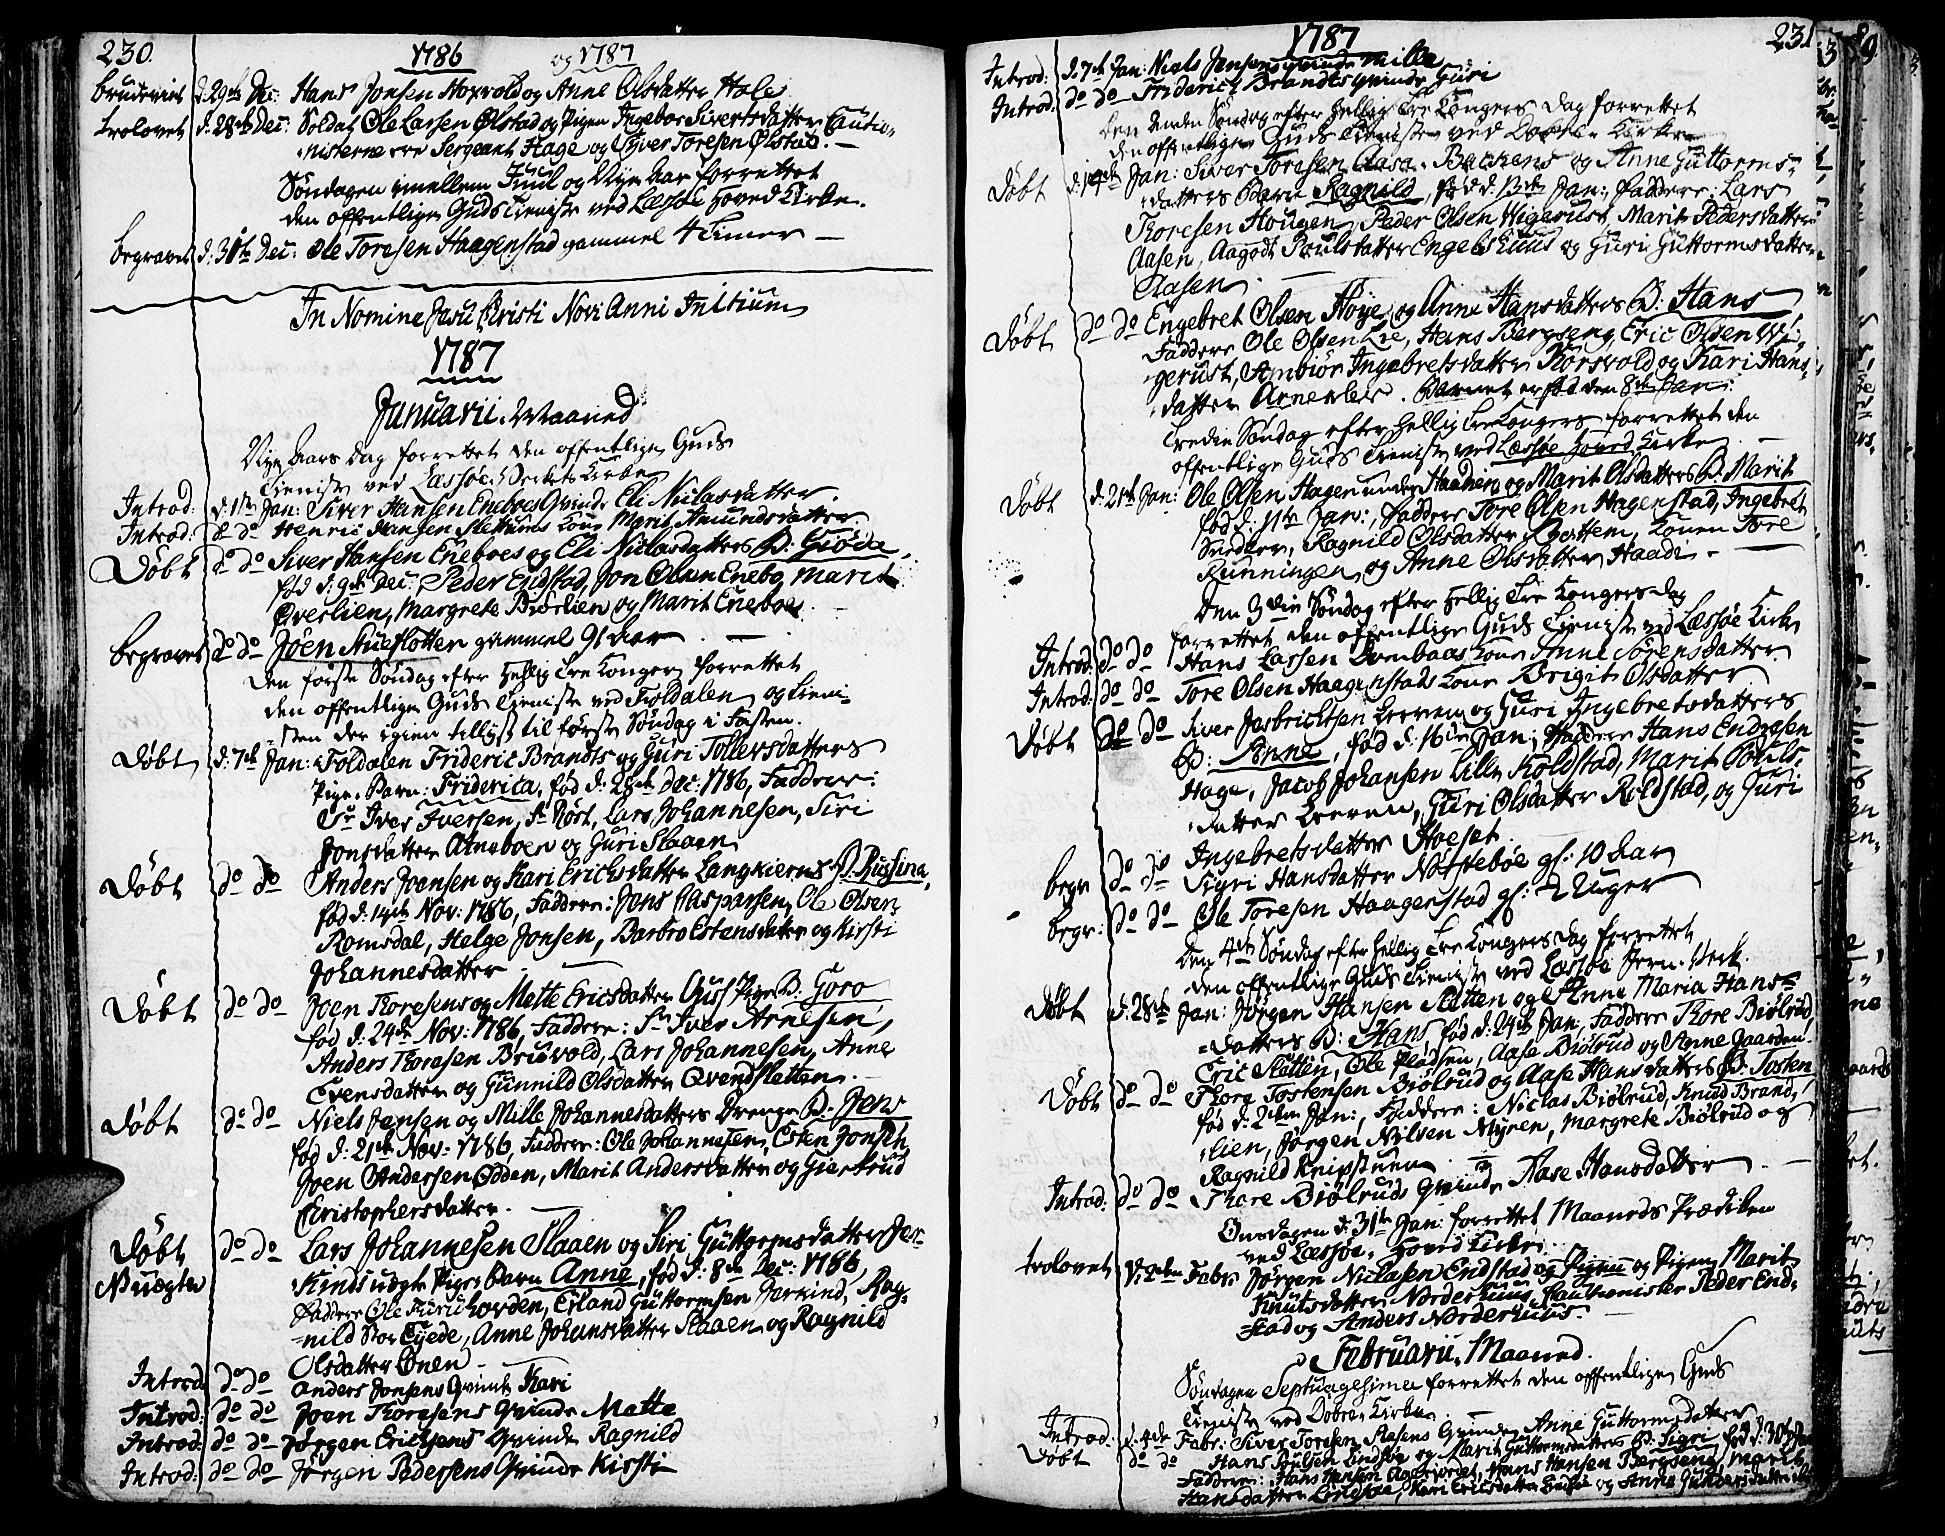 SAH, Lesja prestekontor, Ministerialbok nr. 3, 1777-1819, s. 230-231